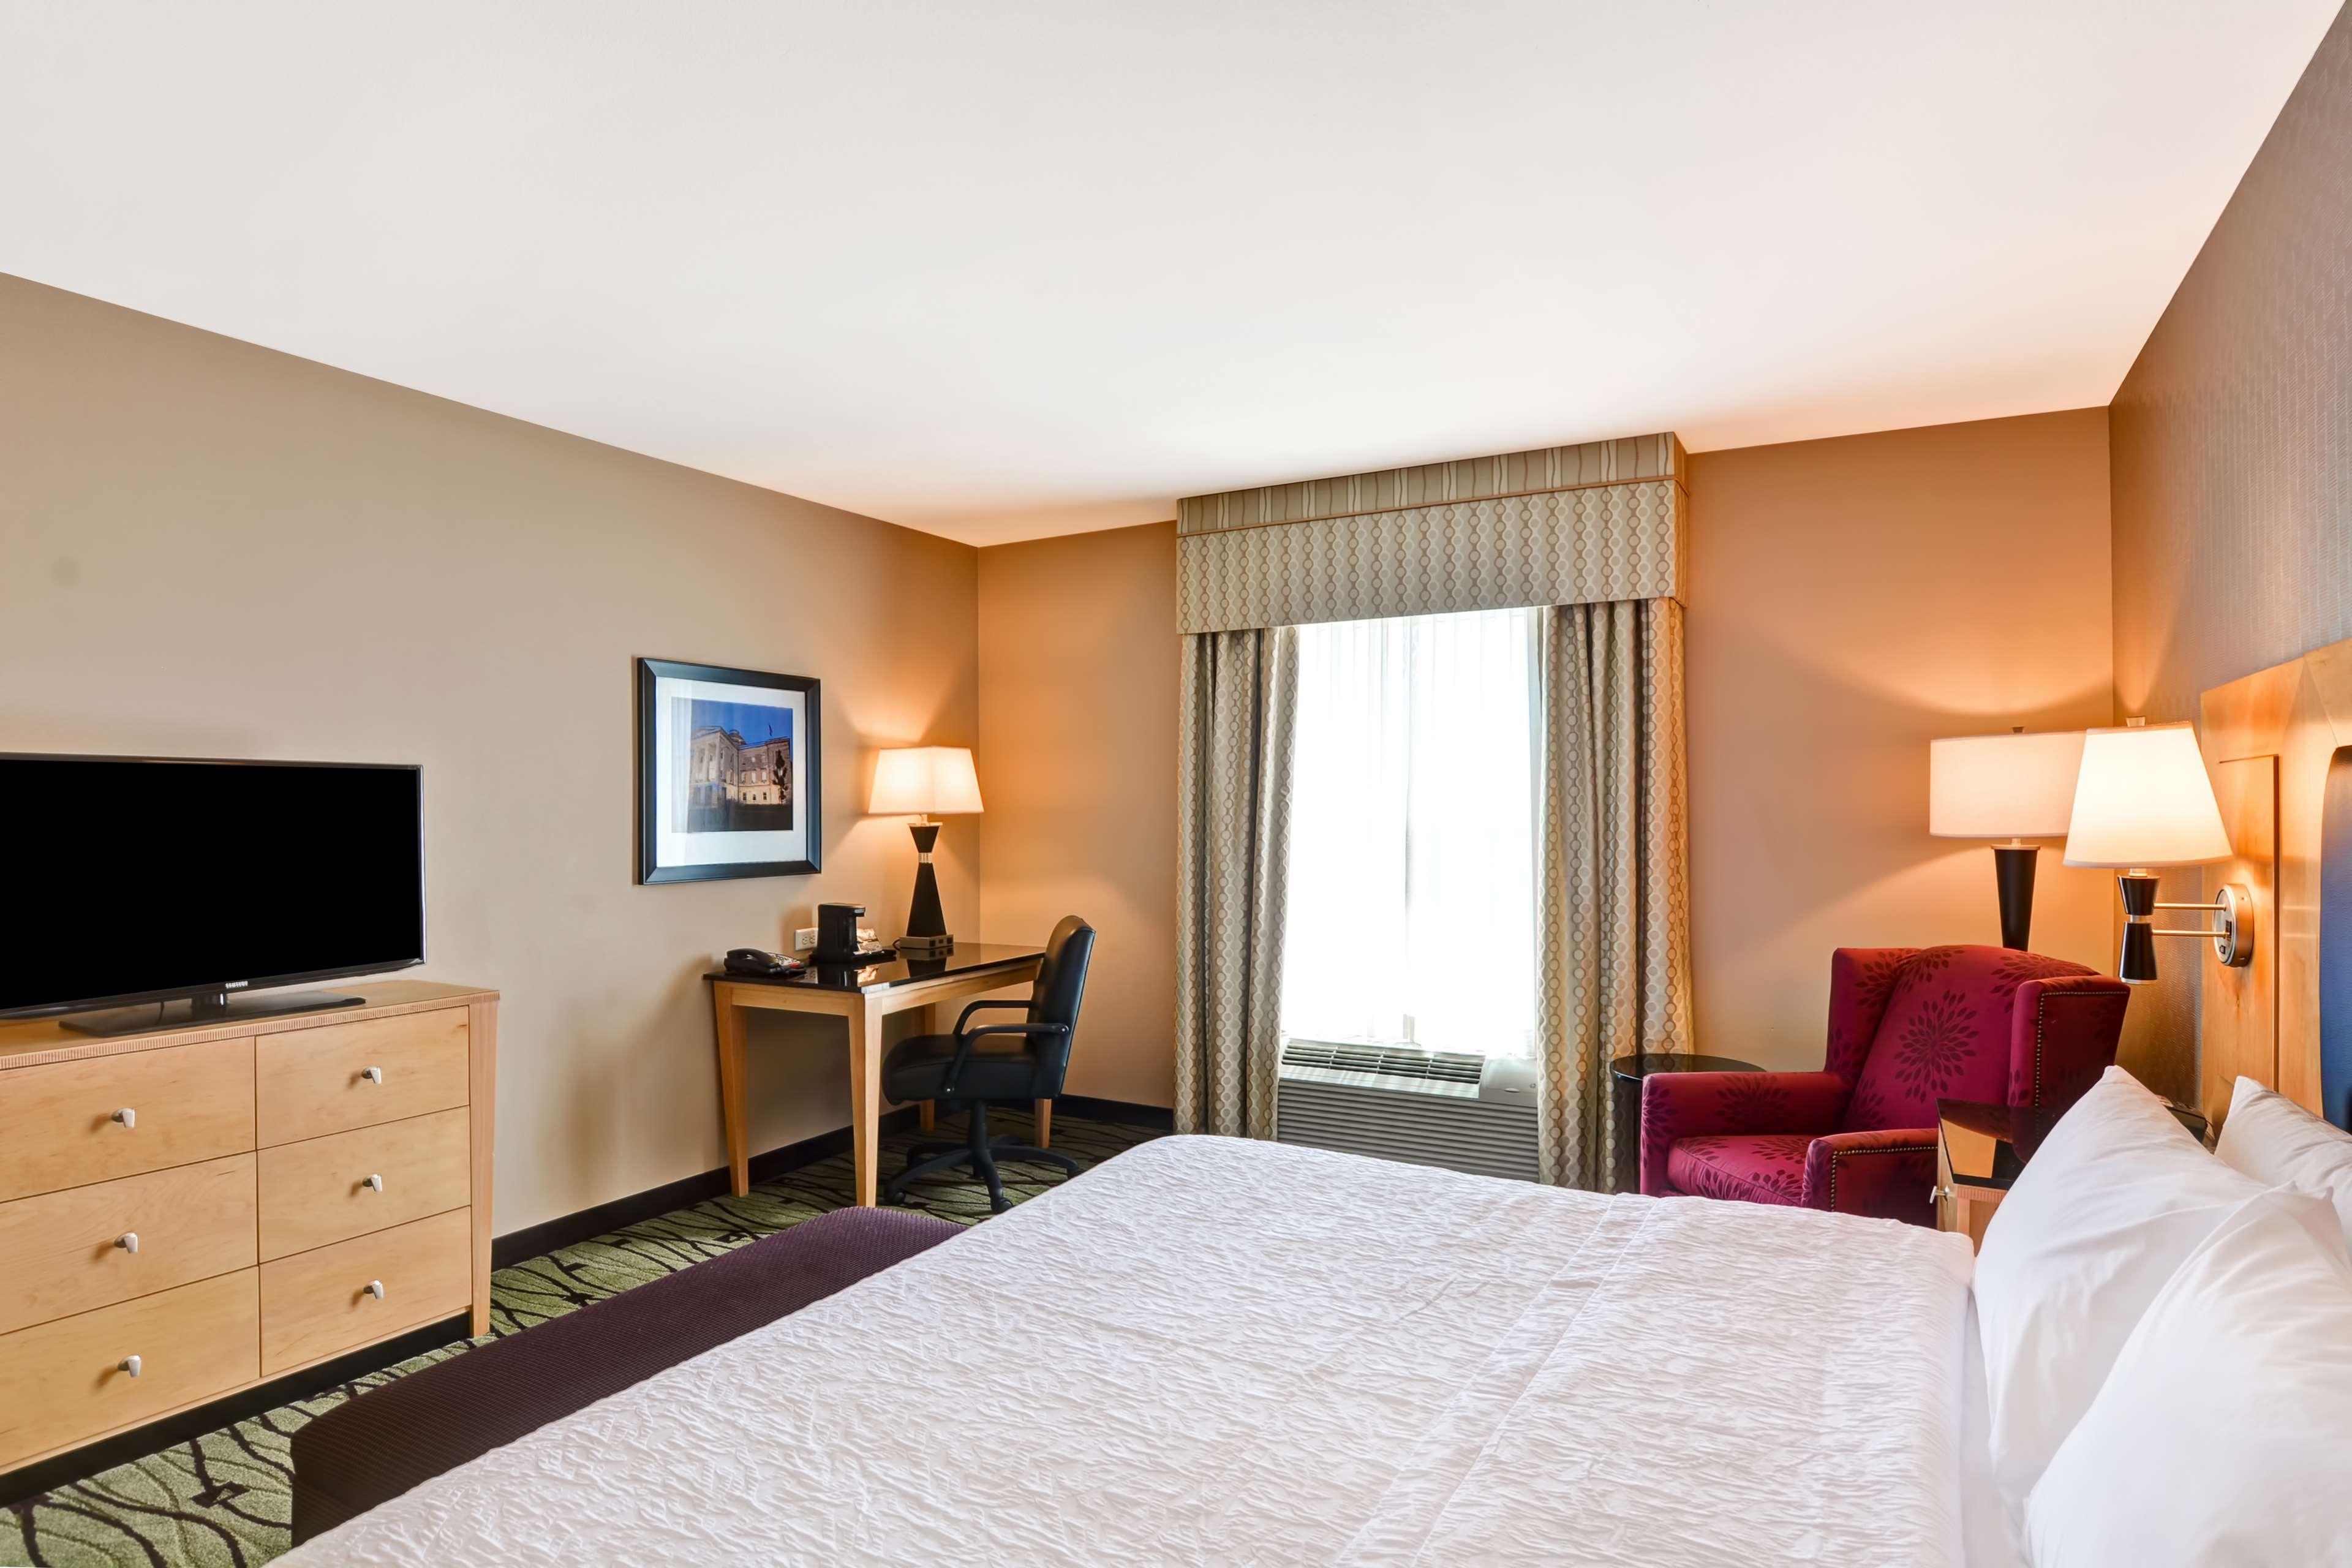 Hampton Inn & Suites Raleigh/Crabtree Valley image 31